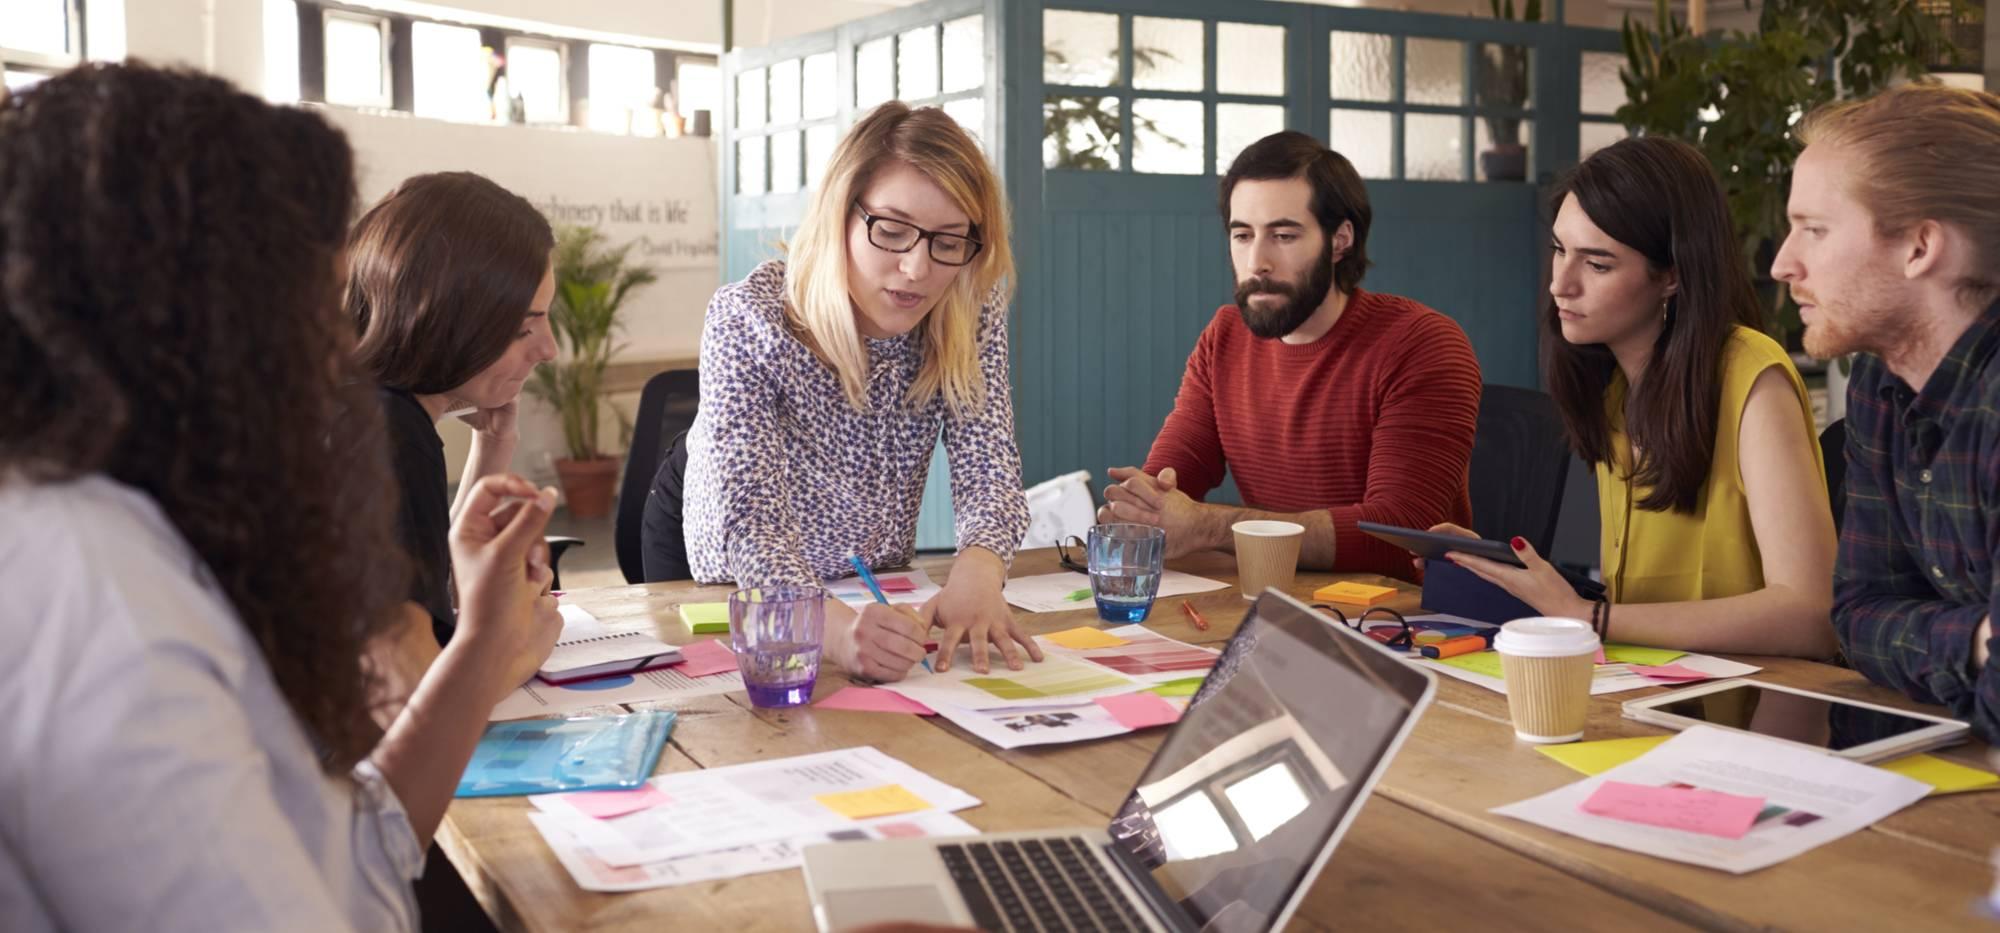 Stage Three - Website Design Planning Meeting